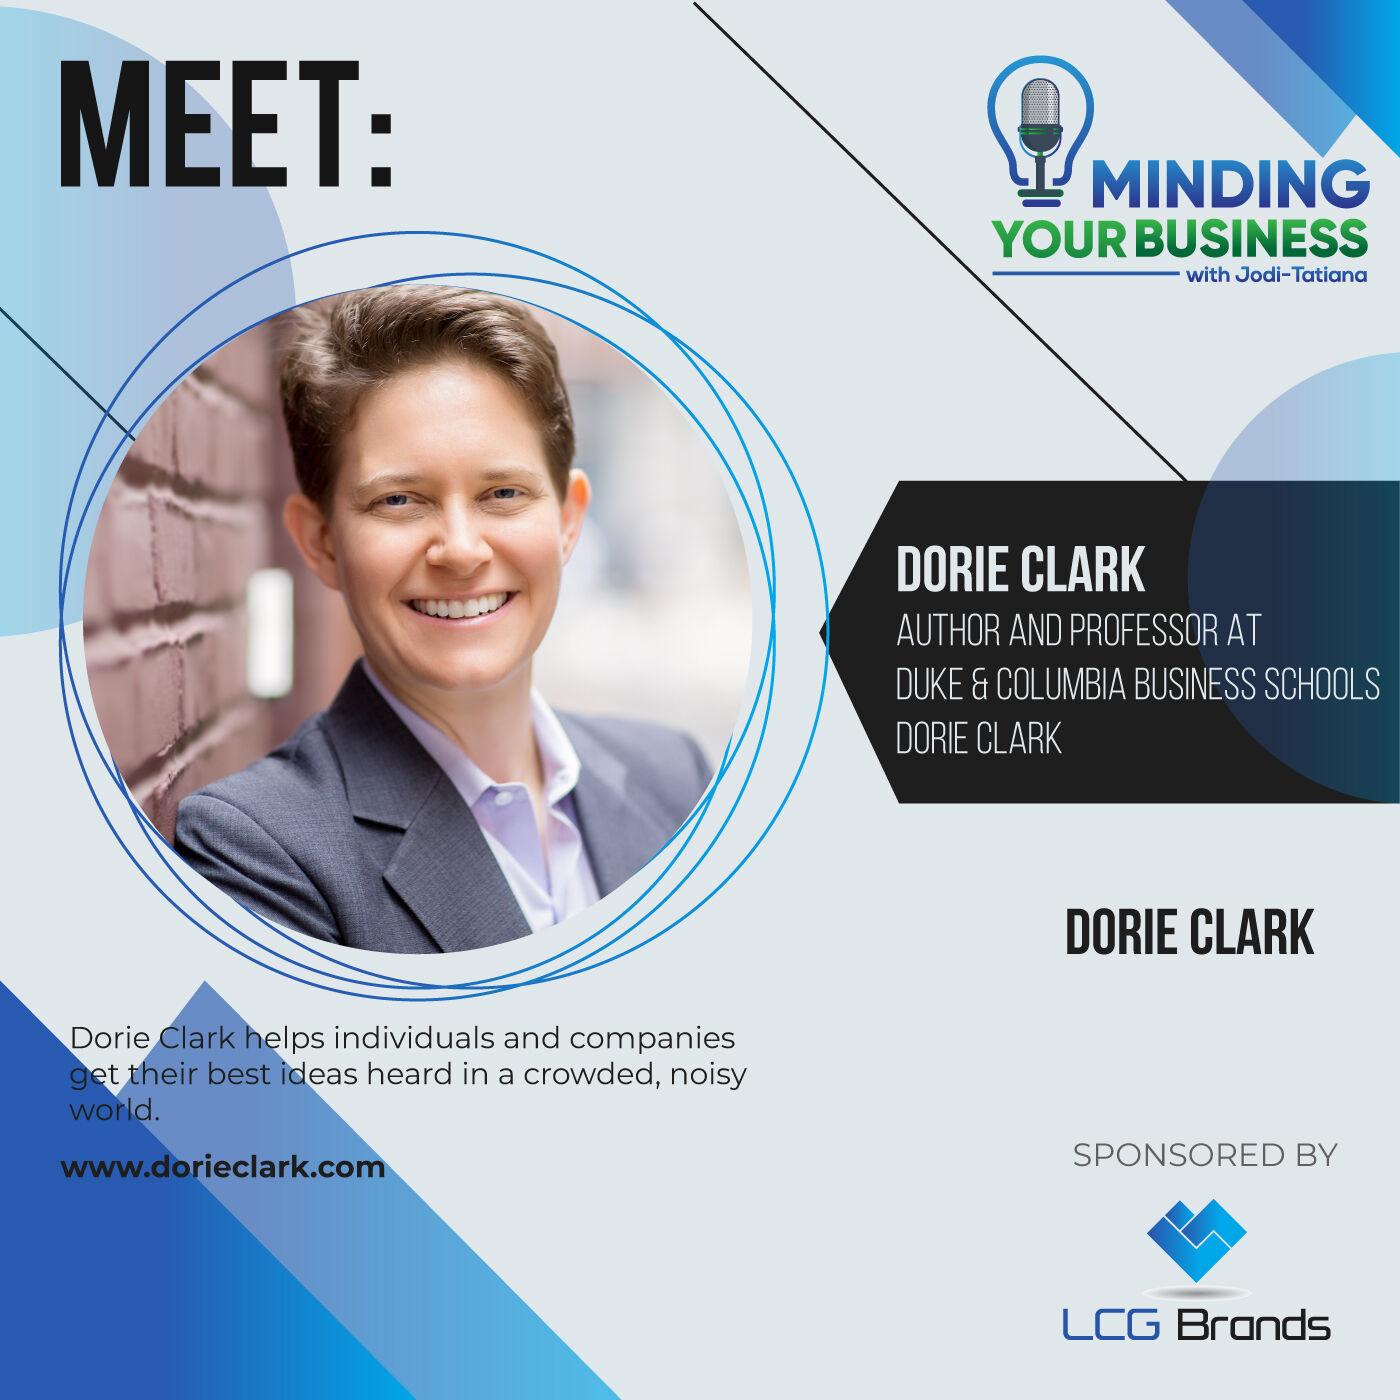 Episode 123: Meet Author and Professor at Duke & Columbia Business Schools, Dorie Clark (New York-USA)